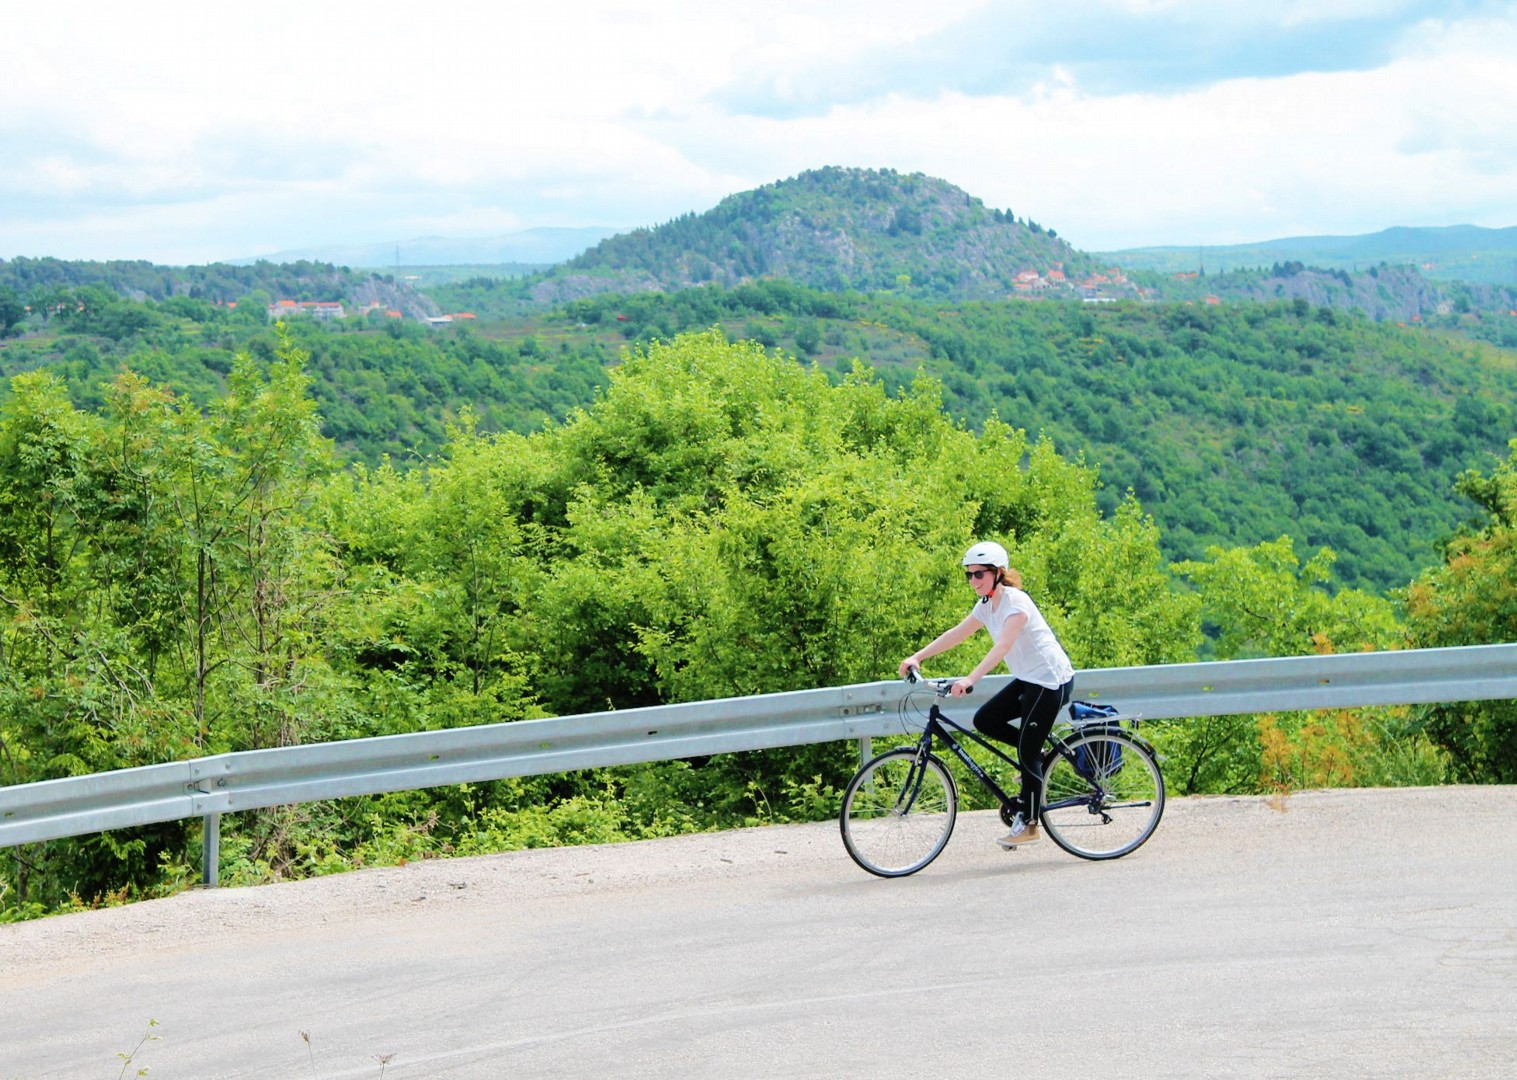 peaceful-cycling-adventure-southern-dalmatia.jpg - Croatia - Southern Dalmatia - Bike and Boat Holiday - Leisure Cycling